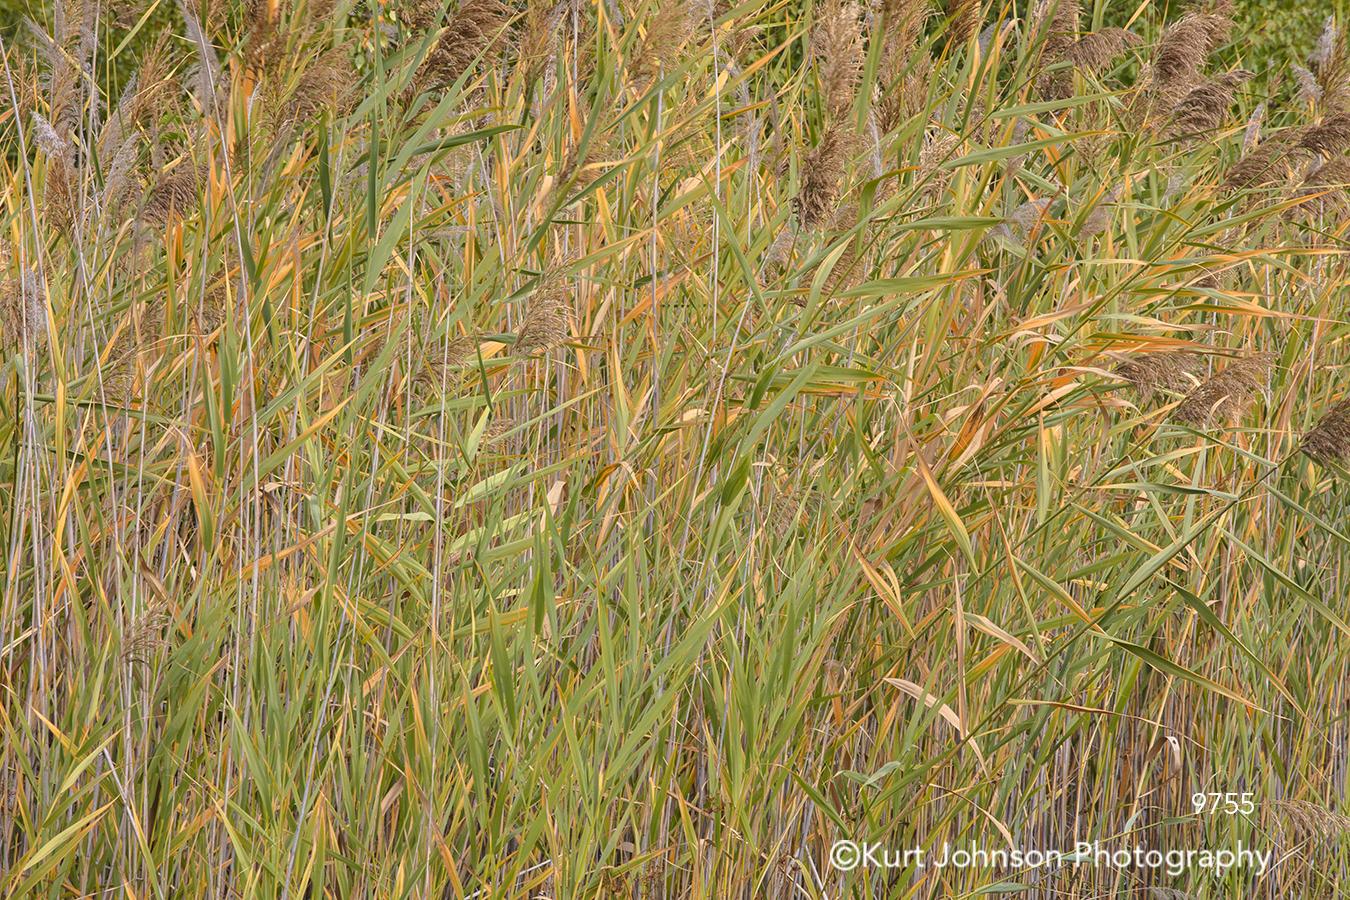 green yellow brown grass blades field grasses